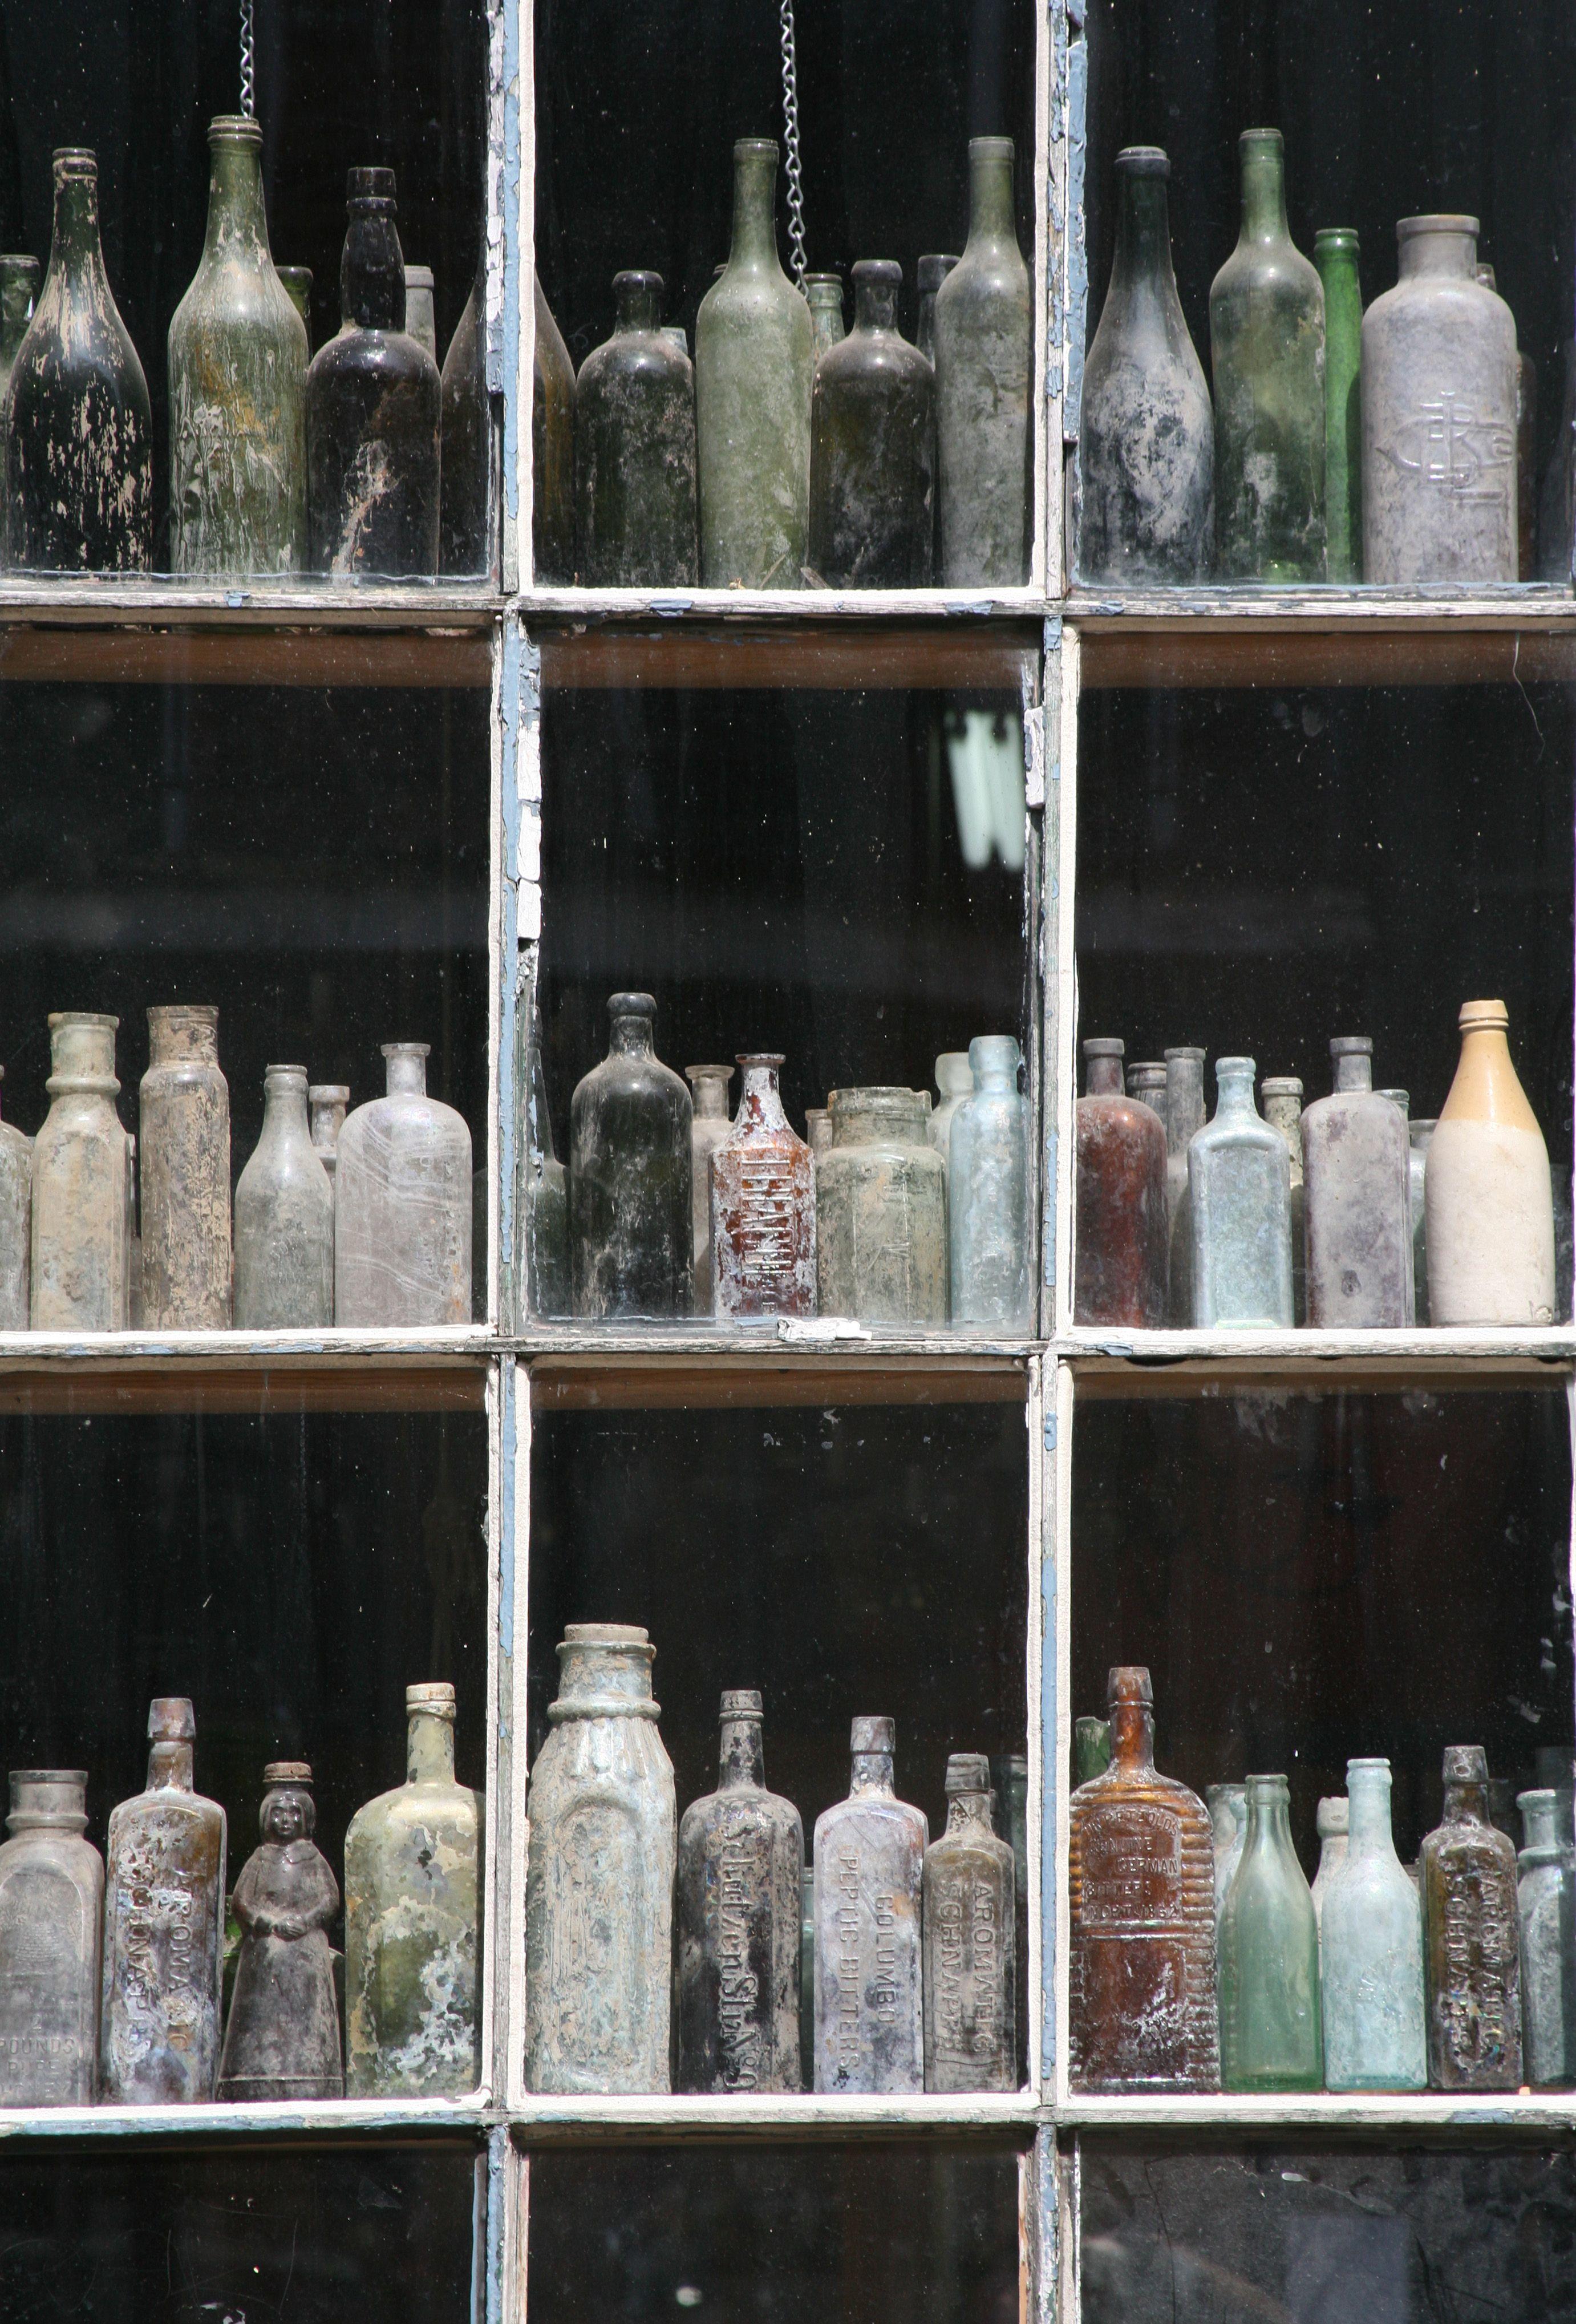 NOLA bottles in time